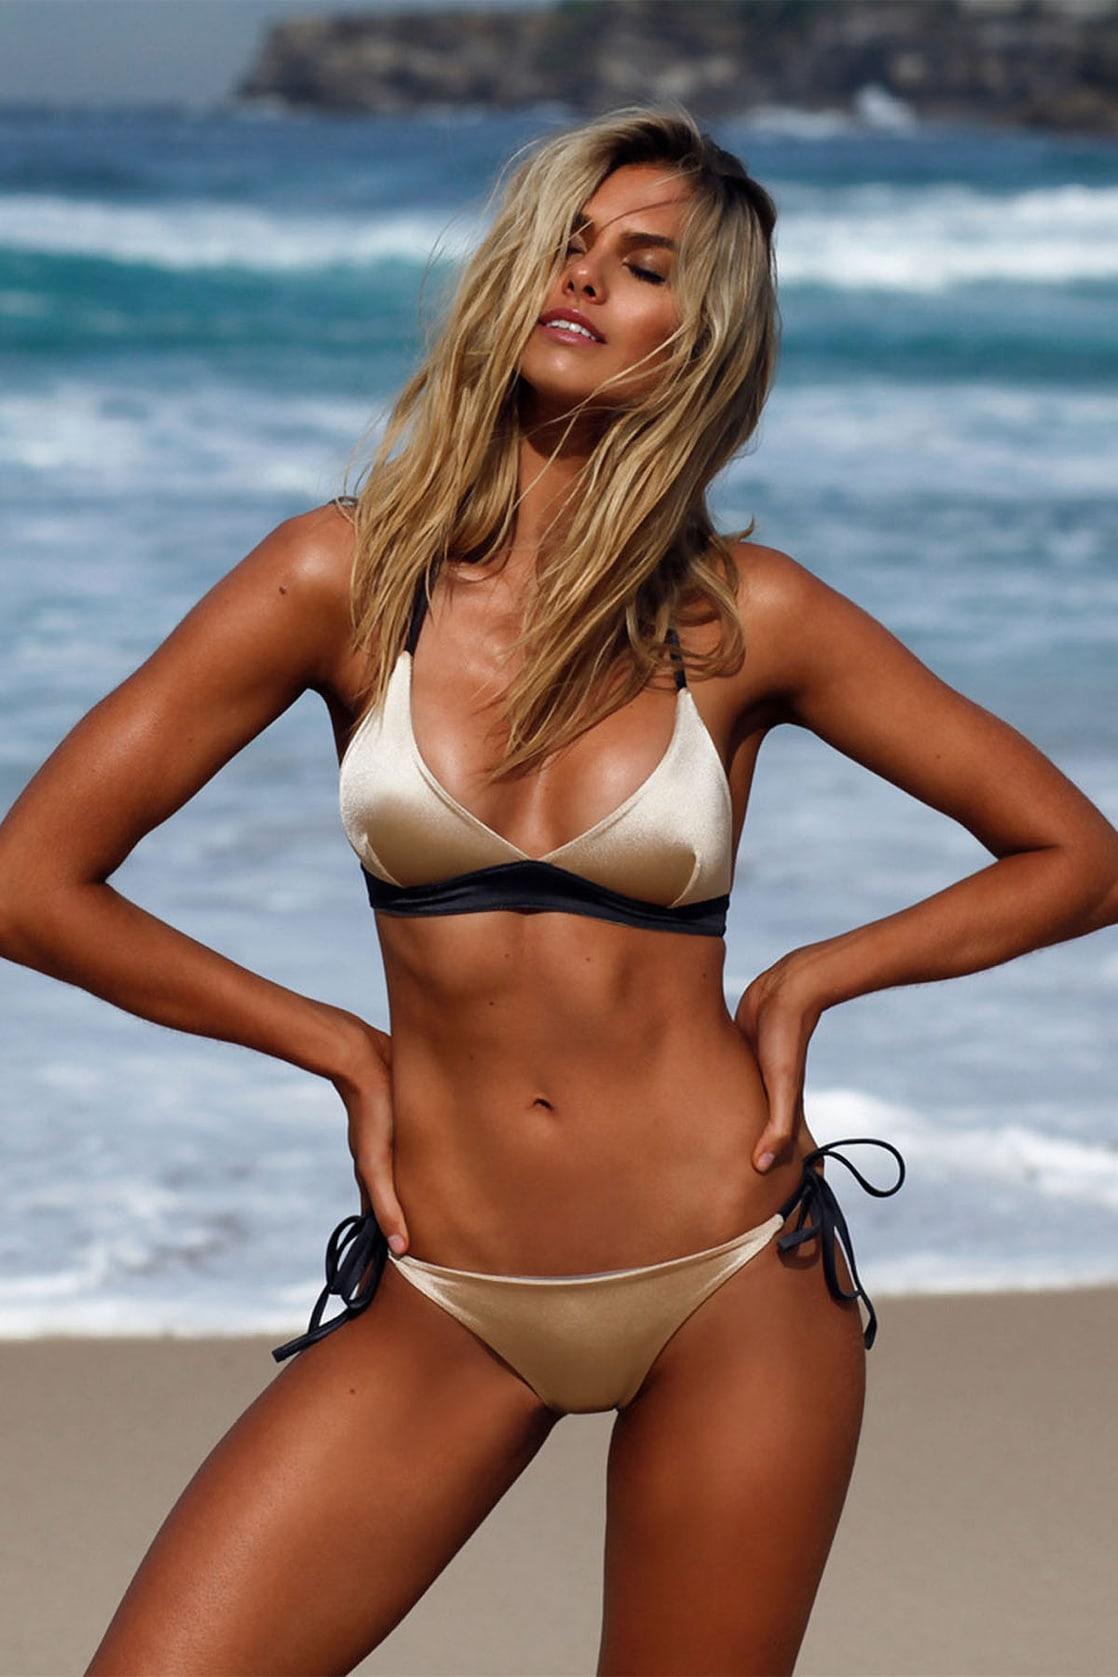 Hot Natalie Jayne Roser nude (73 photos), Topless, Is a cute, Boobs, underwear 2015